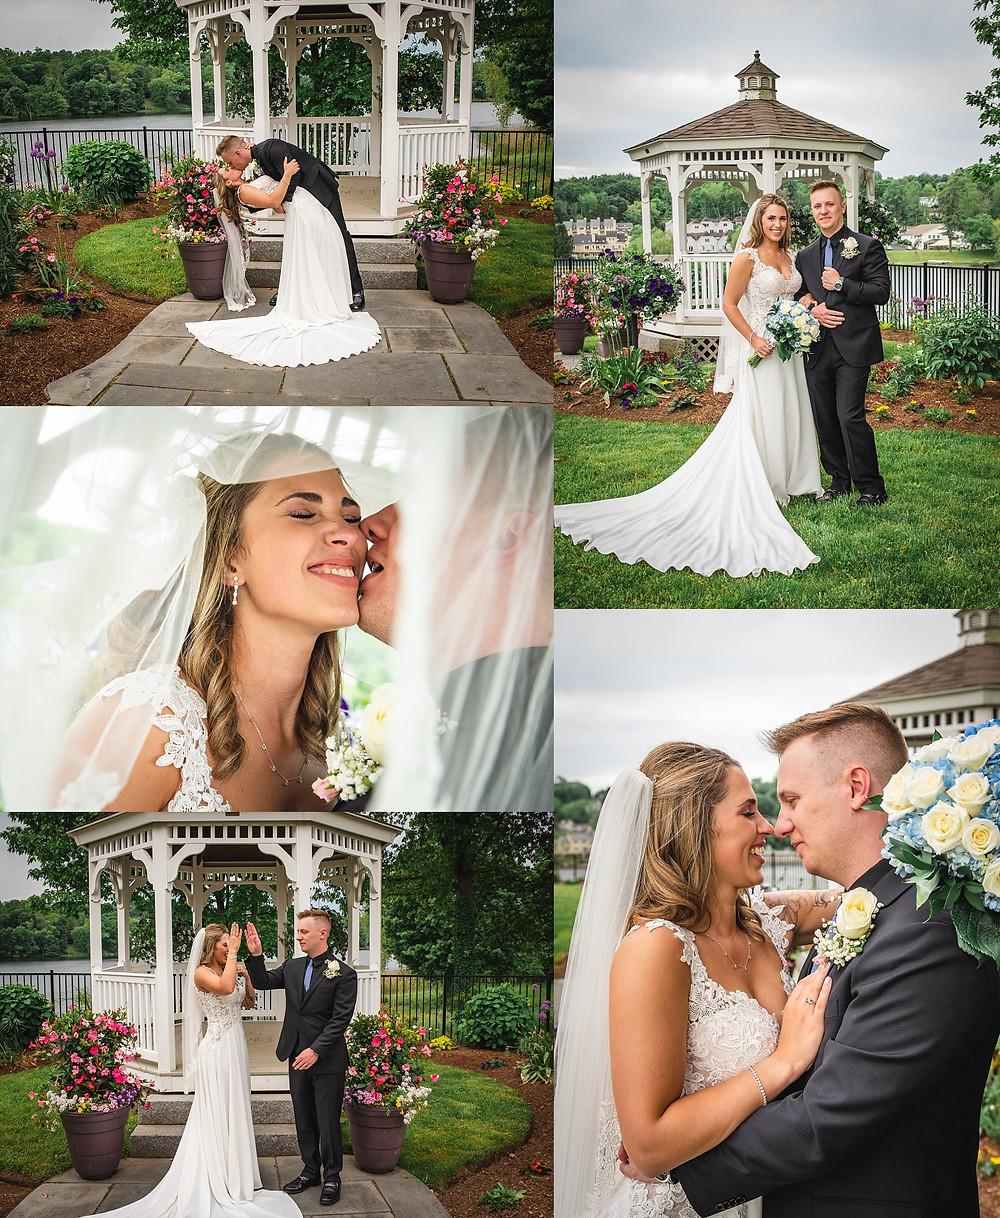 CT Wedding Photography Bride and Groom Portraits